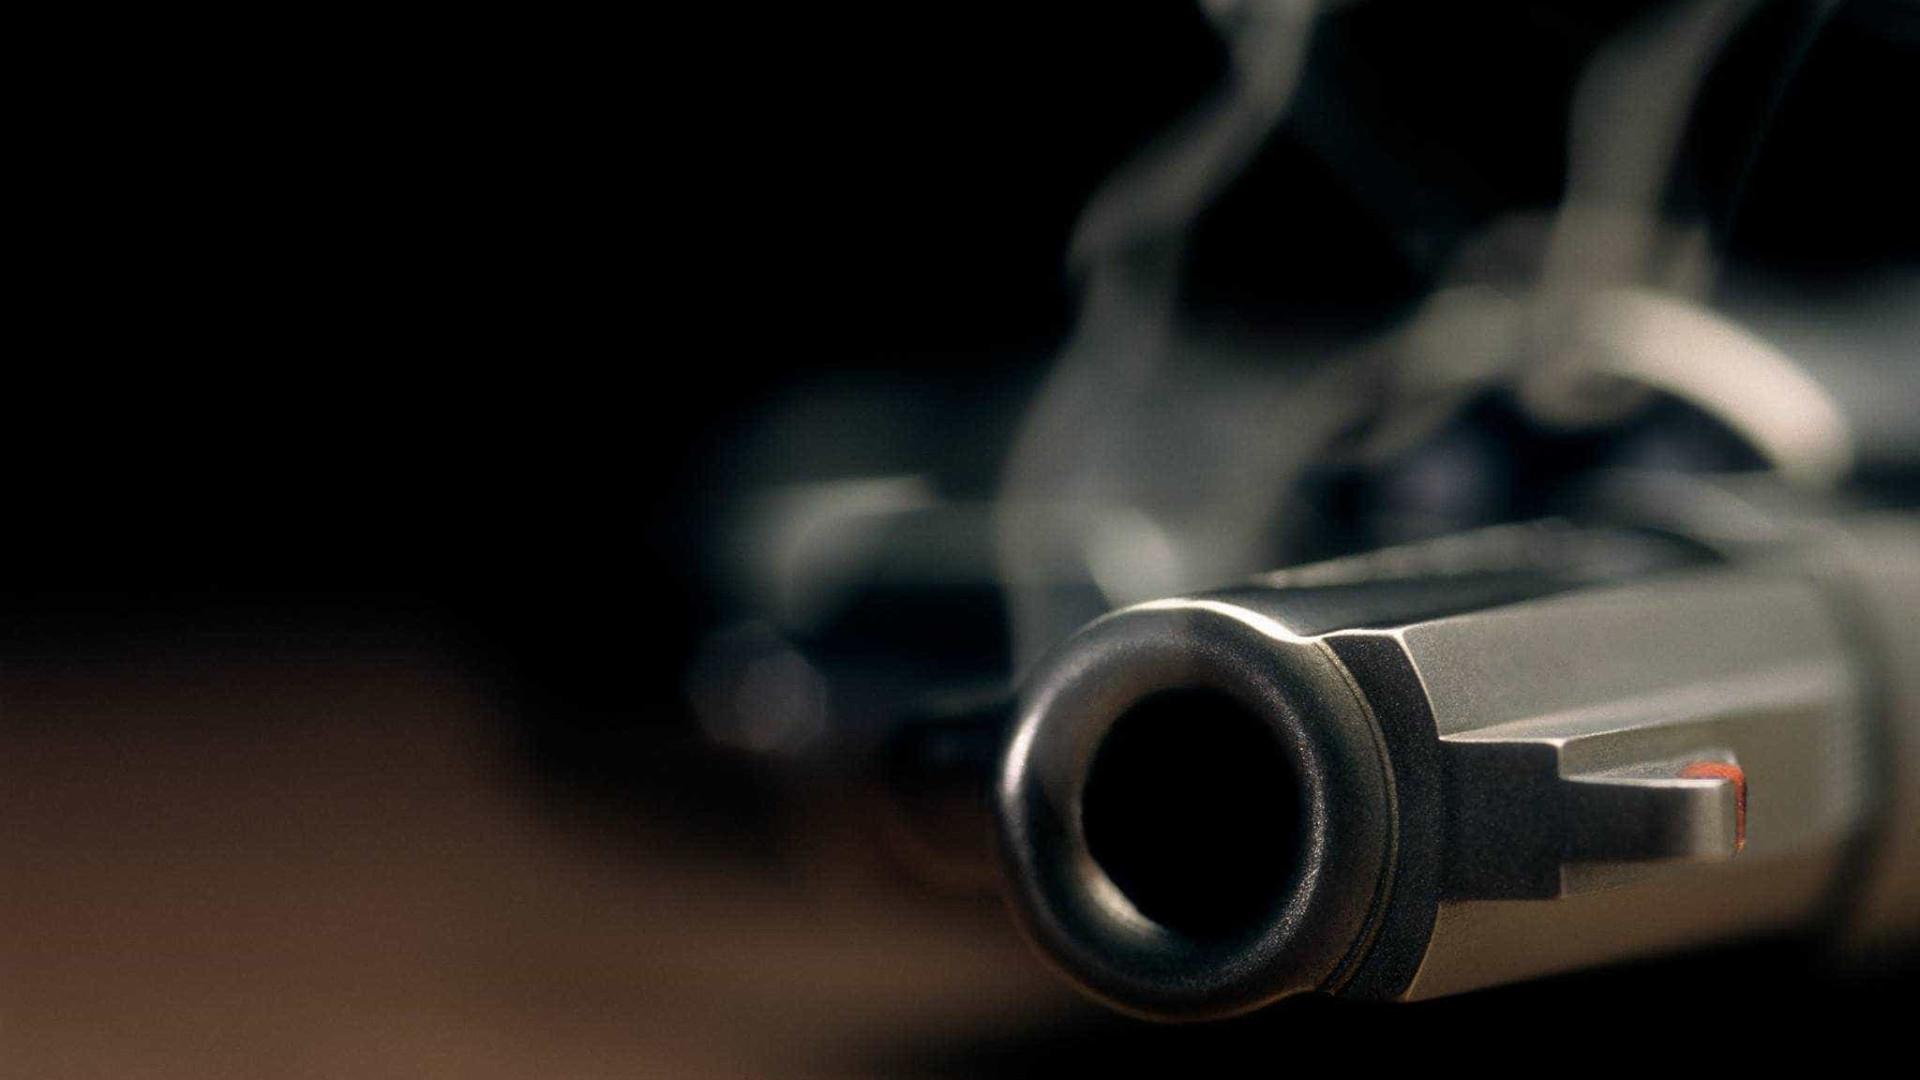 Brasil é 3º maior exportador de armas, segundo estudo